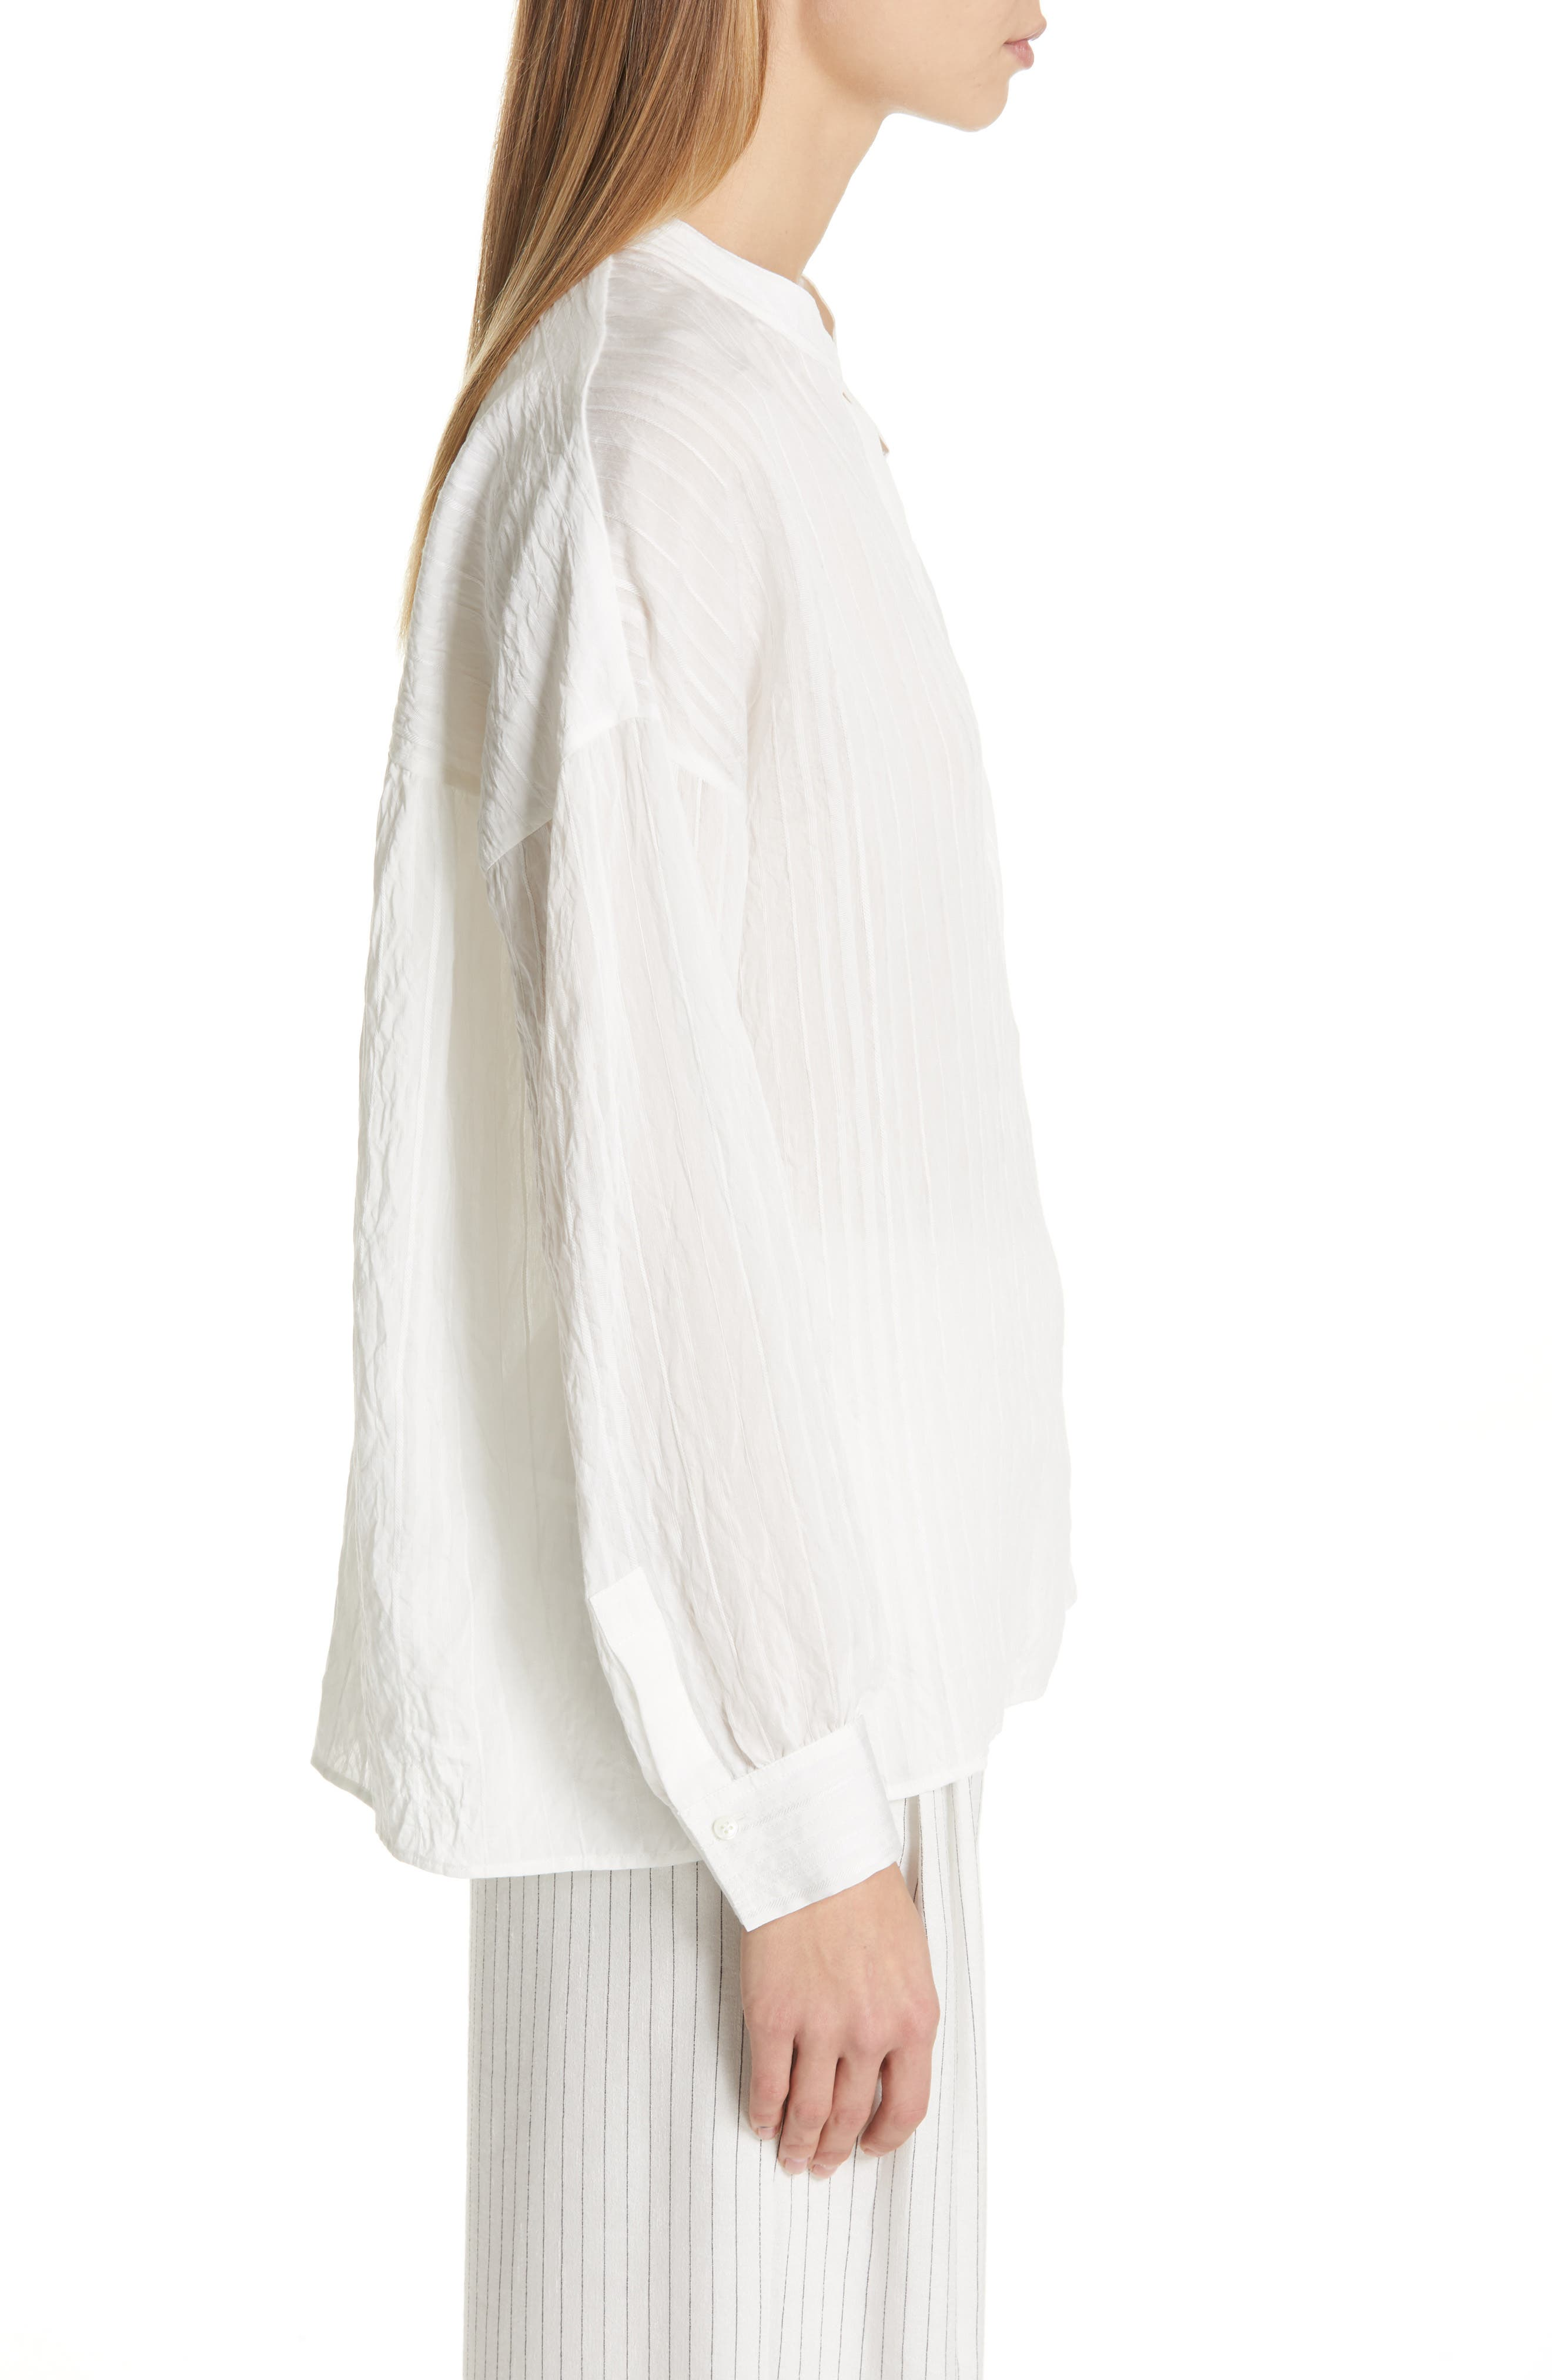 VINCE, Stripe Drop Sleeve Shirt, Alternate thumbnail 3, color, OPTIC WHITE